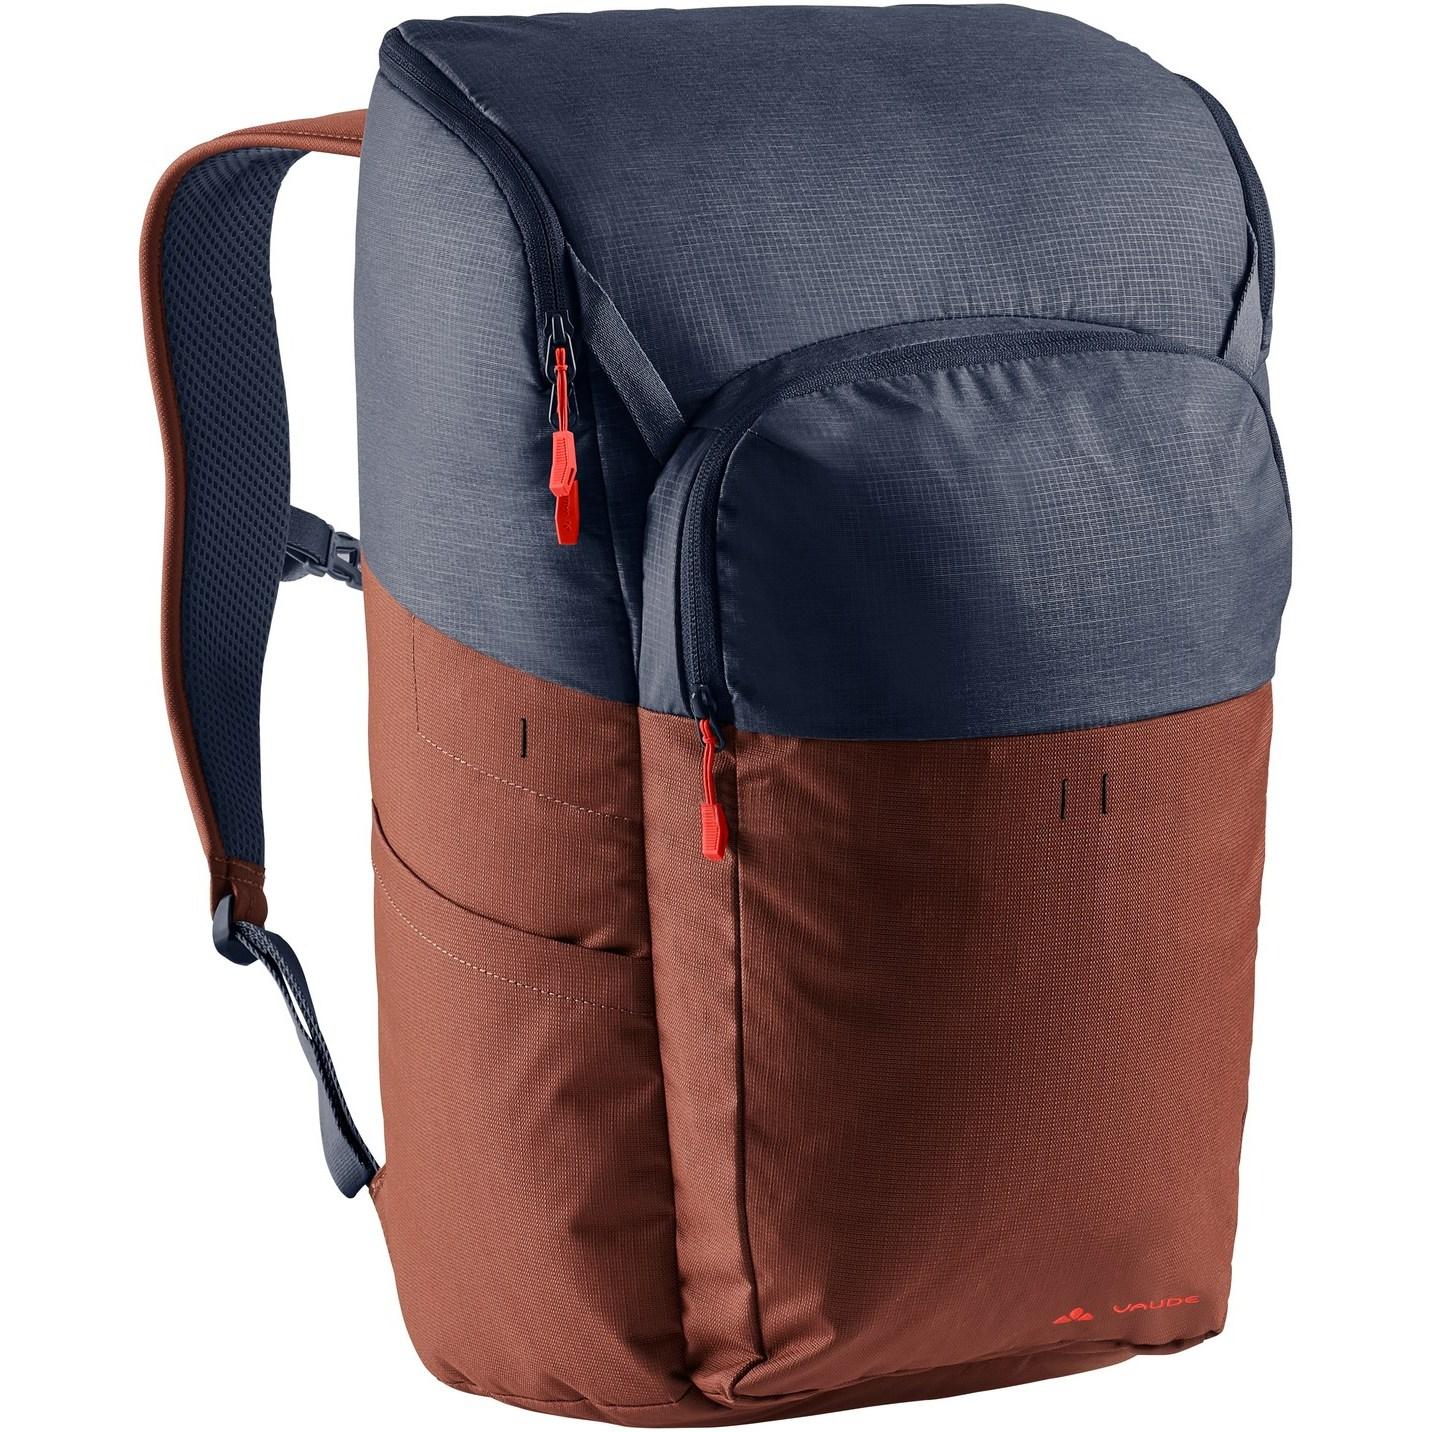 Image of Vaude Albali Backpack - chocolate